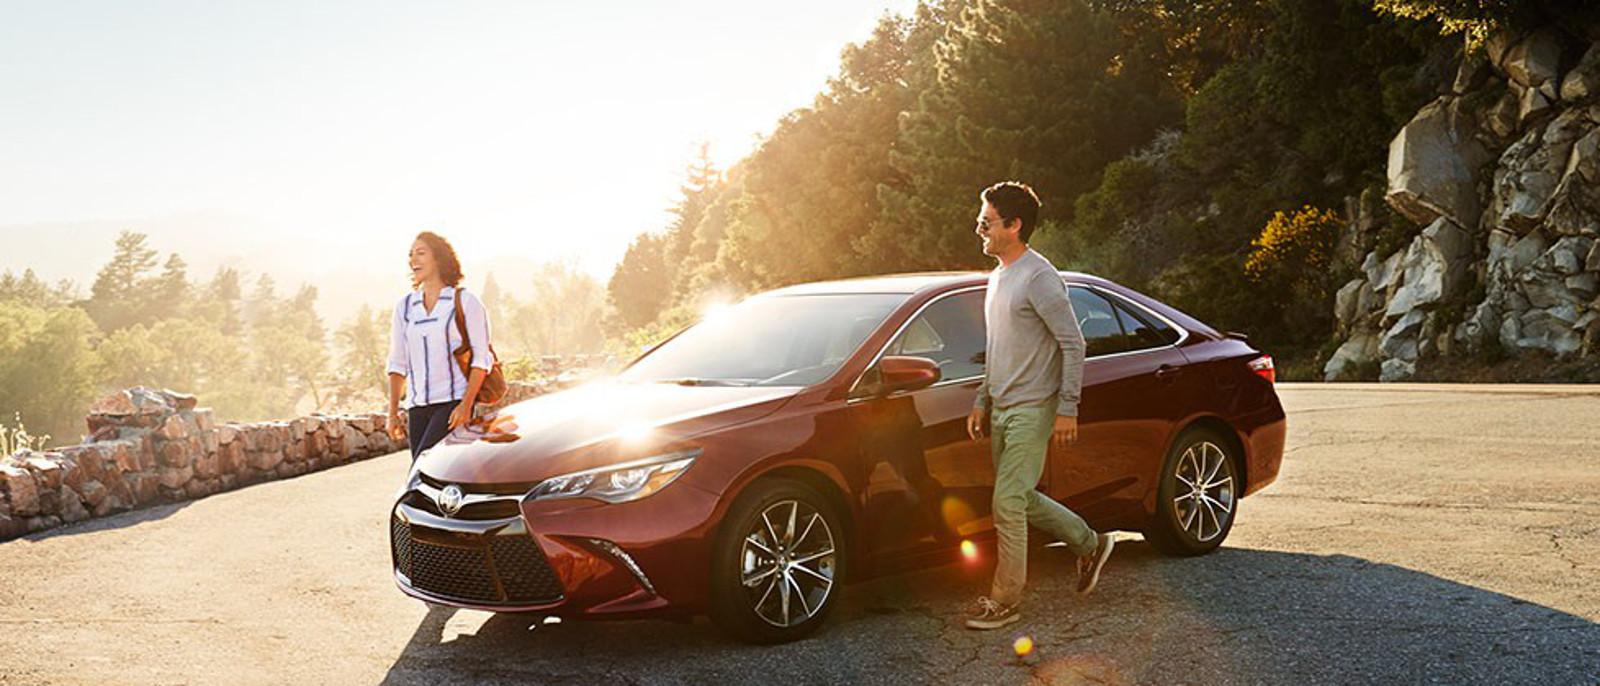 Couple exit 2015 Toyota Camry Hybrid